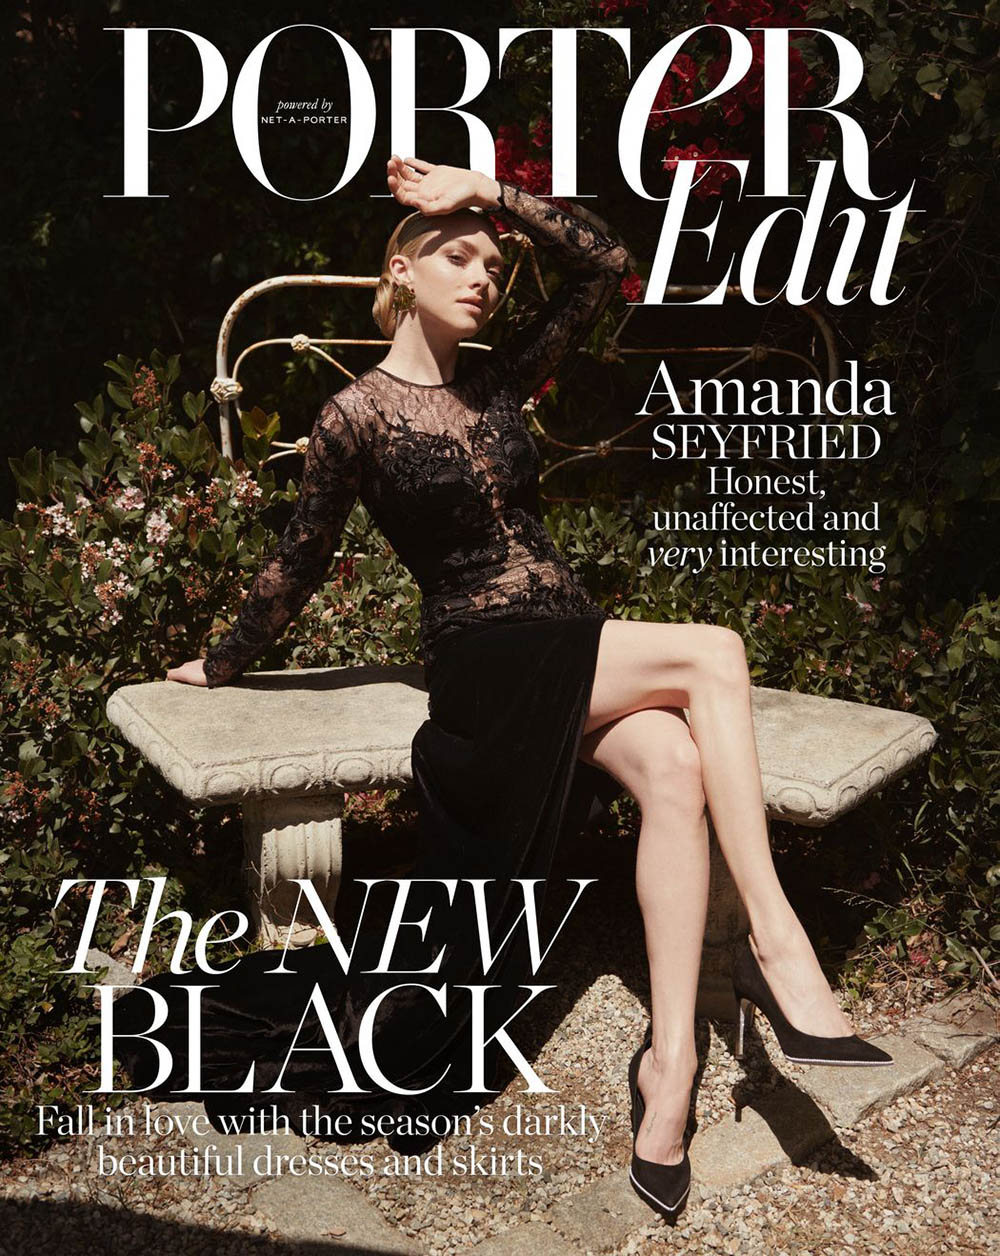 Amanda Seyfried covers Porter Edit July 13th, 2018 by Ward Ivan Rafik